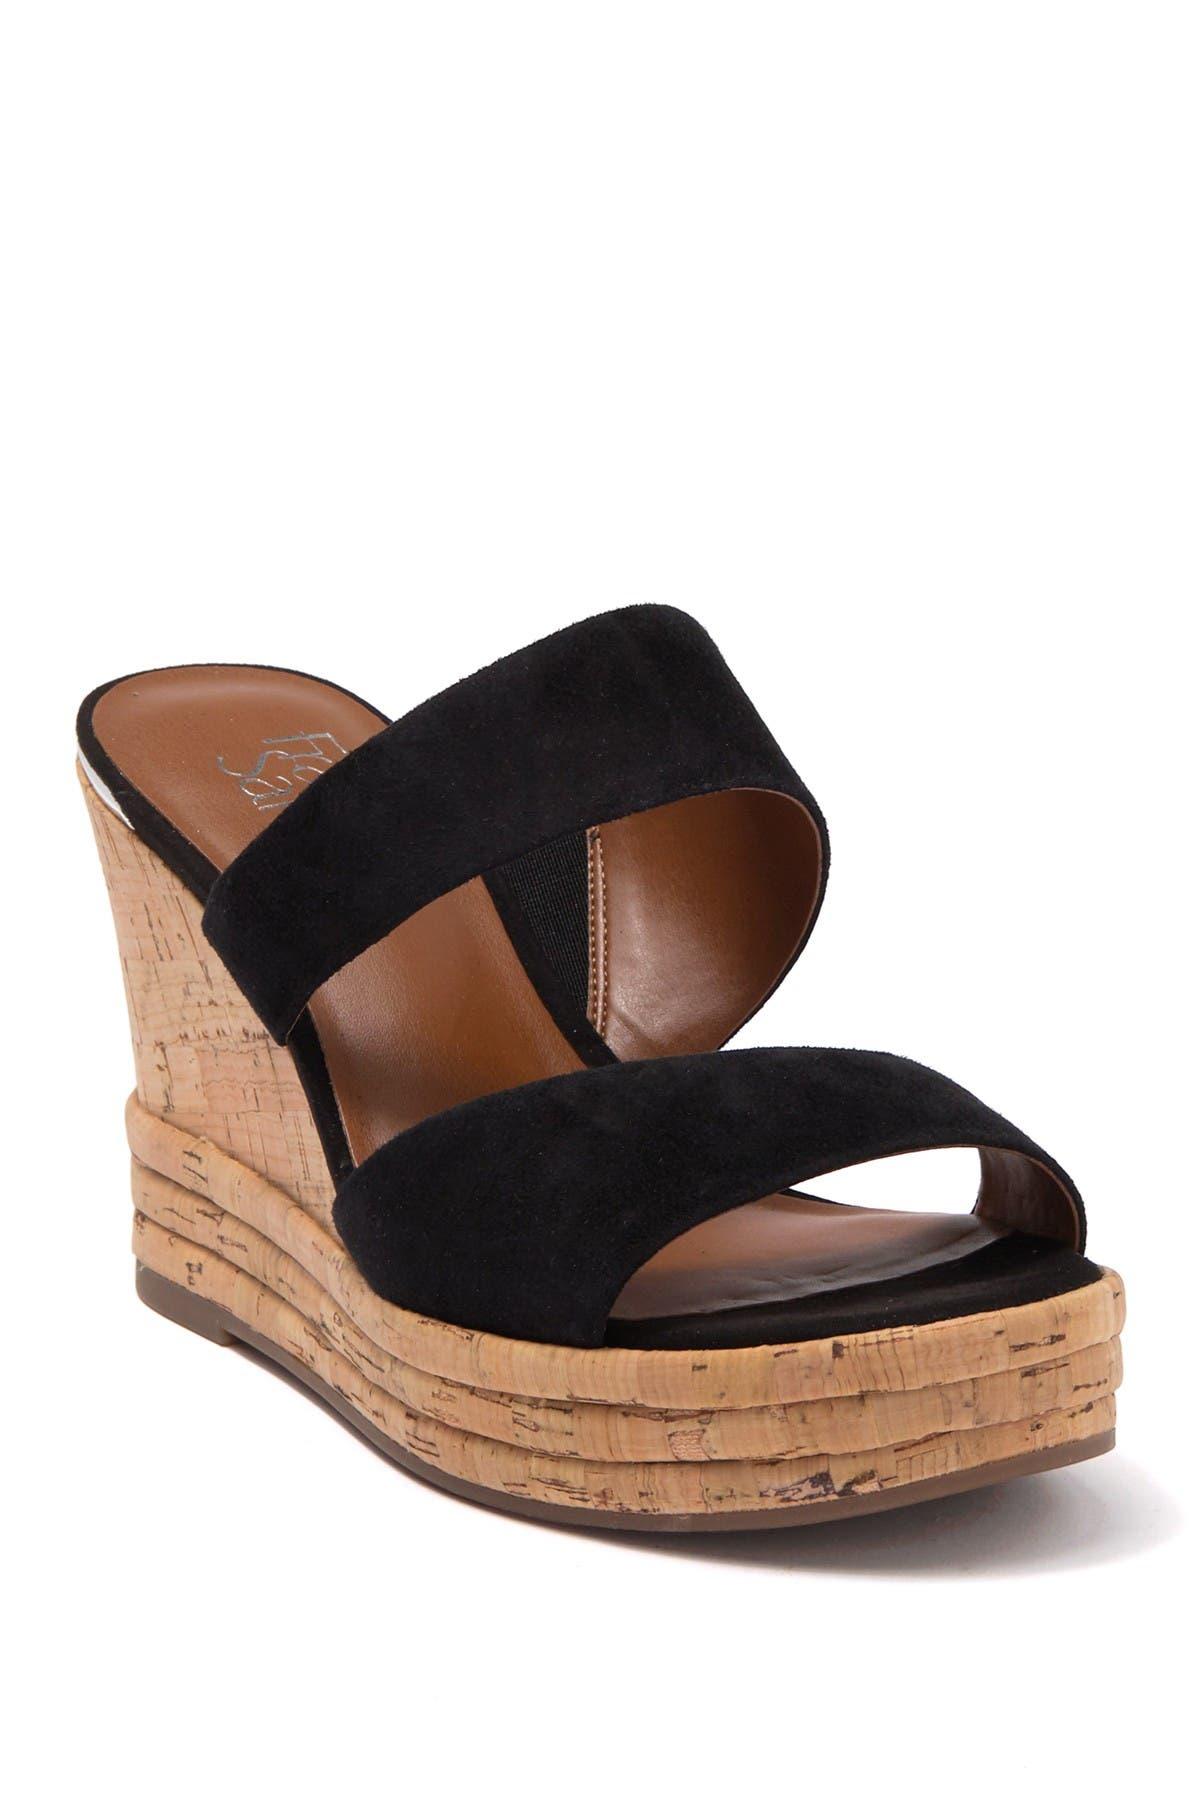 Franco Sarto | Fiore Wedge Sandal